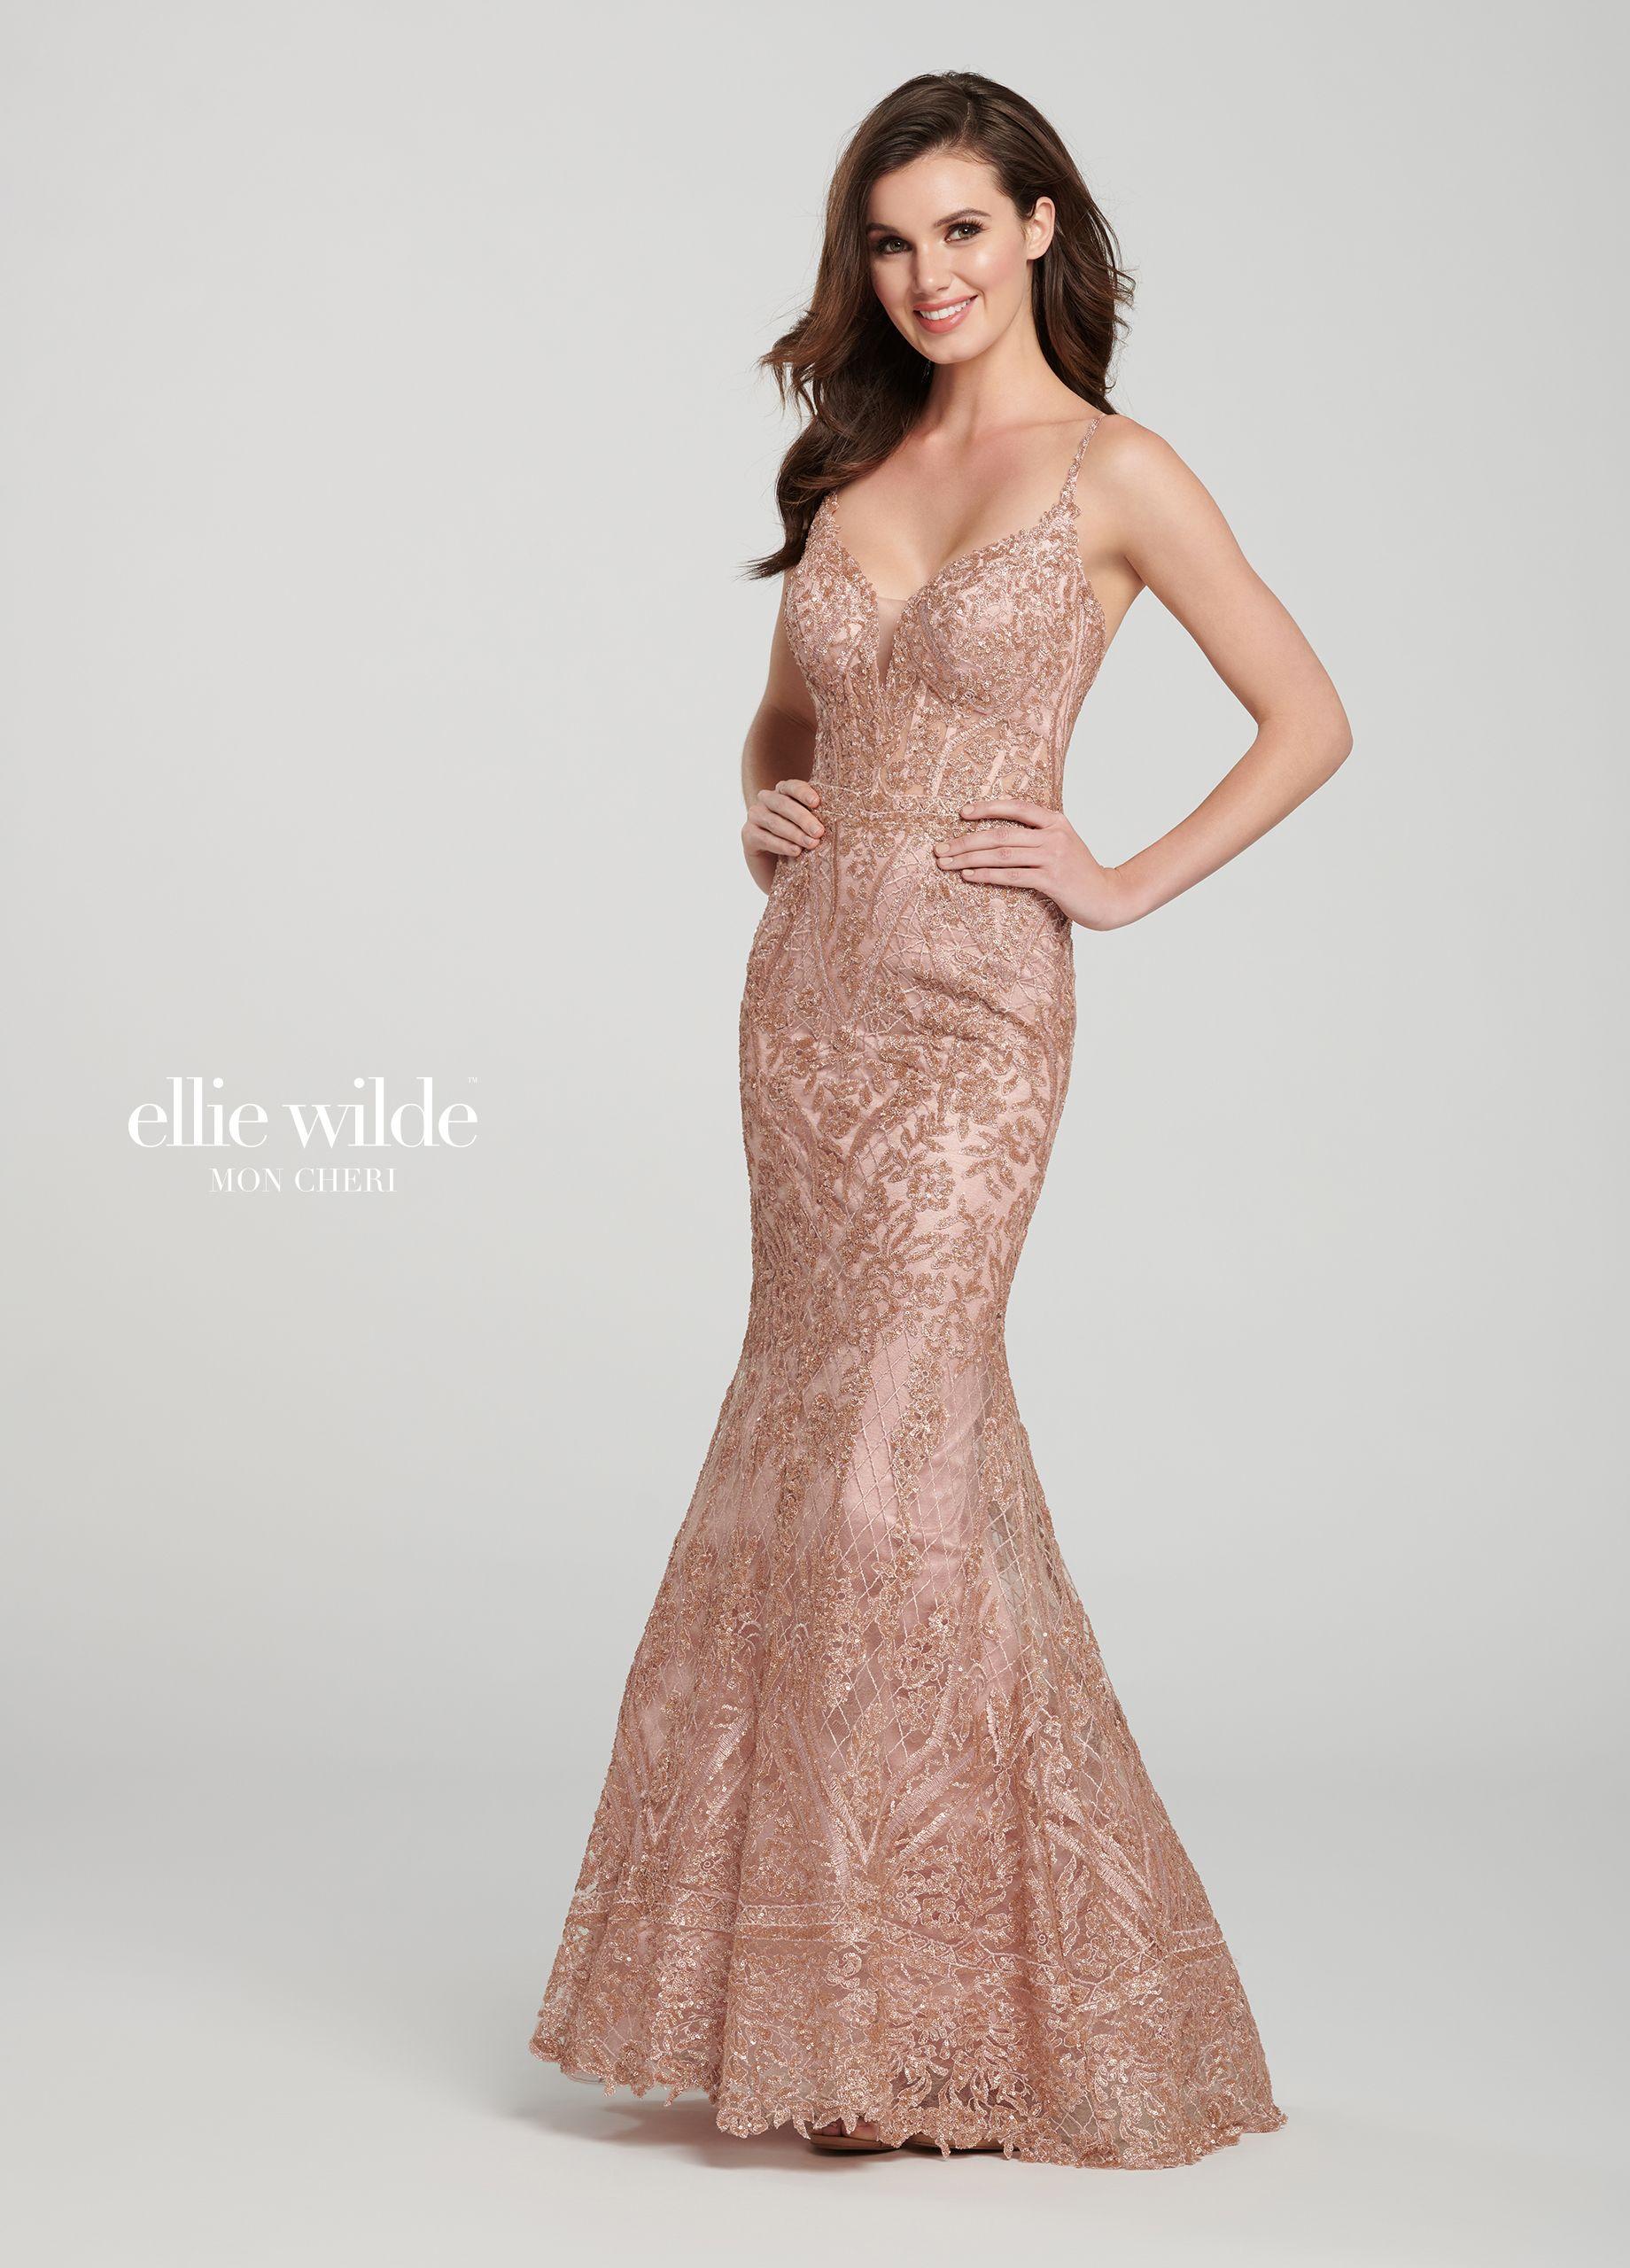 Ellie Wilde Ew119088 Ellie Wilde Prom Dress Styles Dresses Ellie Wilde Prom Dresses [ 2560 x 1840 Pixel ]